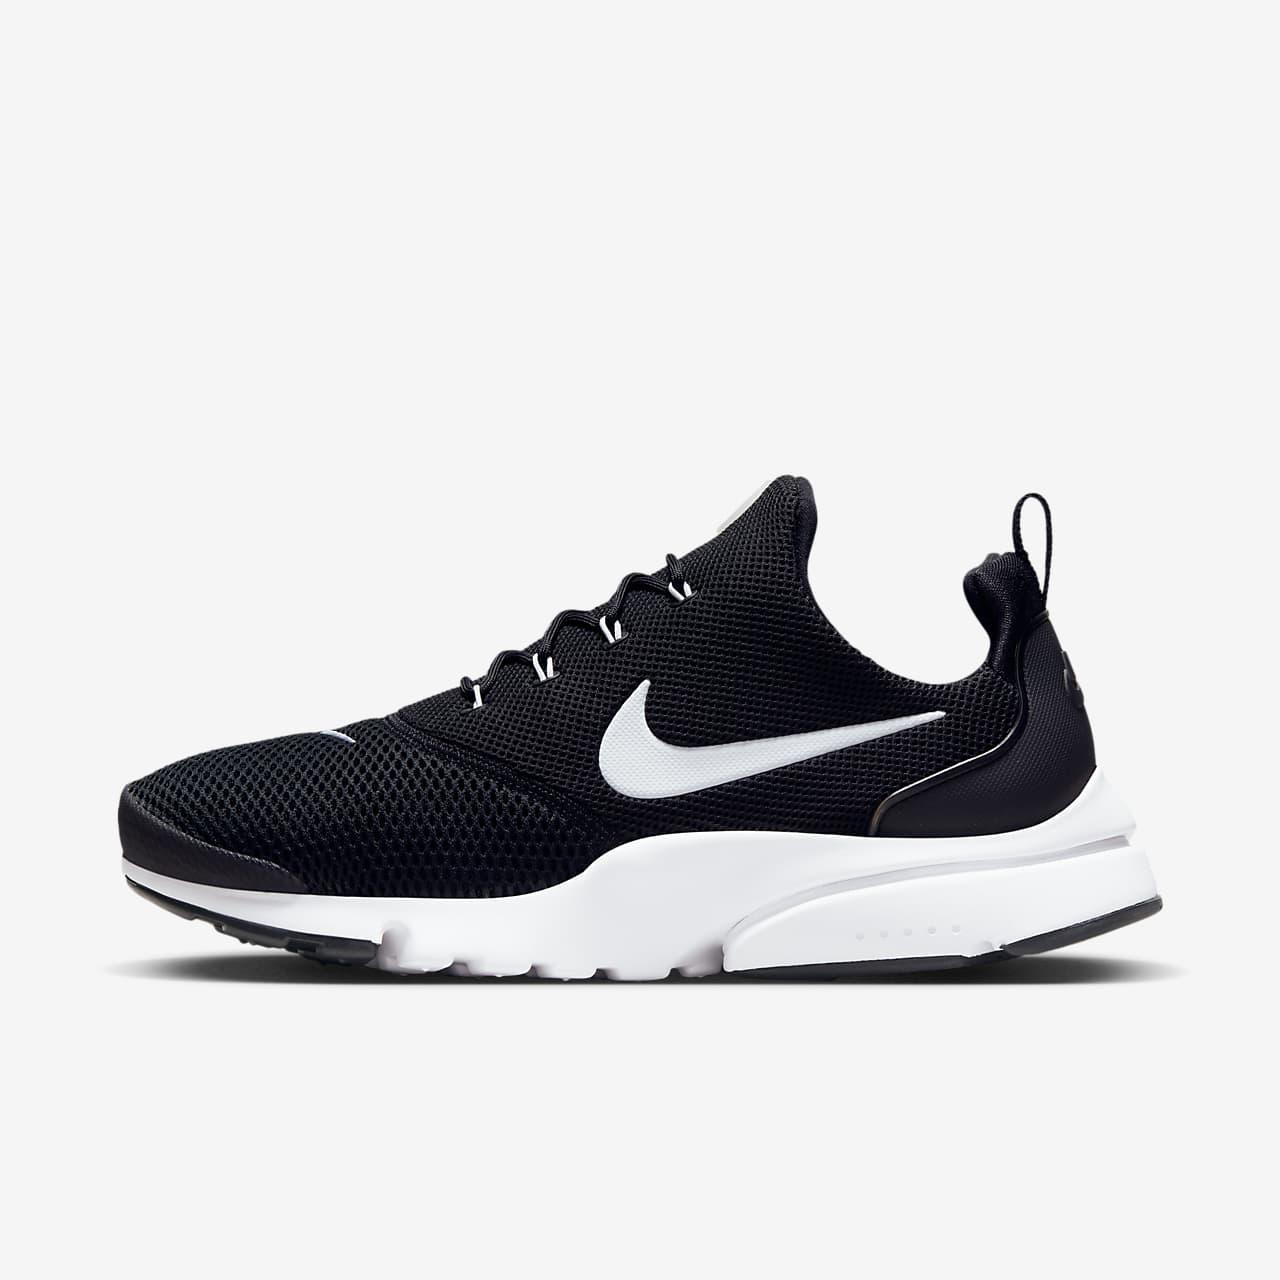 0a1cf640f8df Low Resolution Nike Presto Fly Men s Shoe Nike Presto Fly Men s Shoe